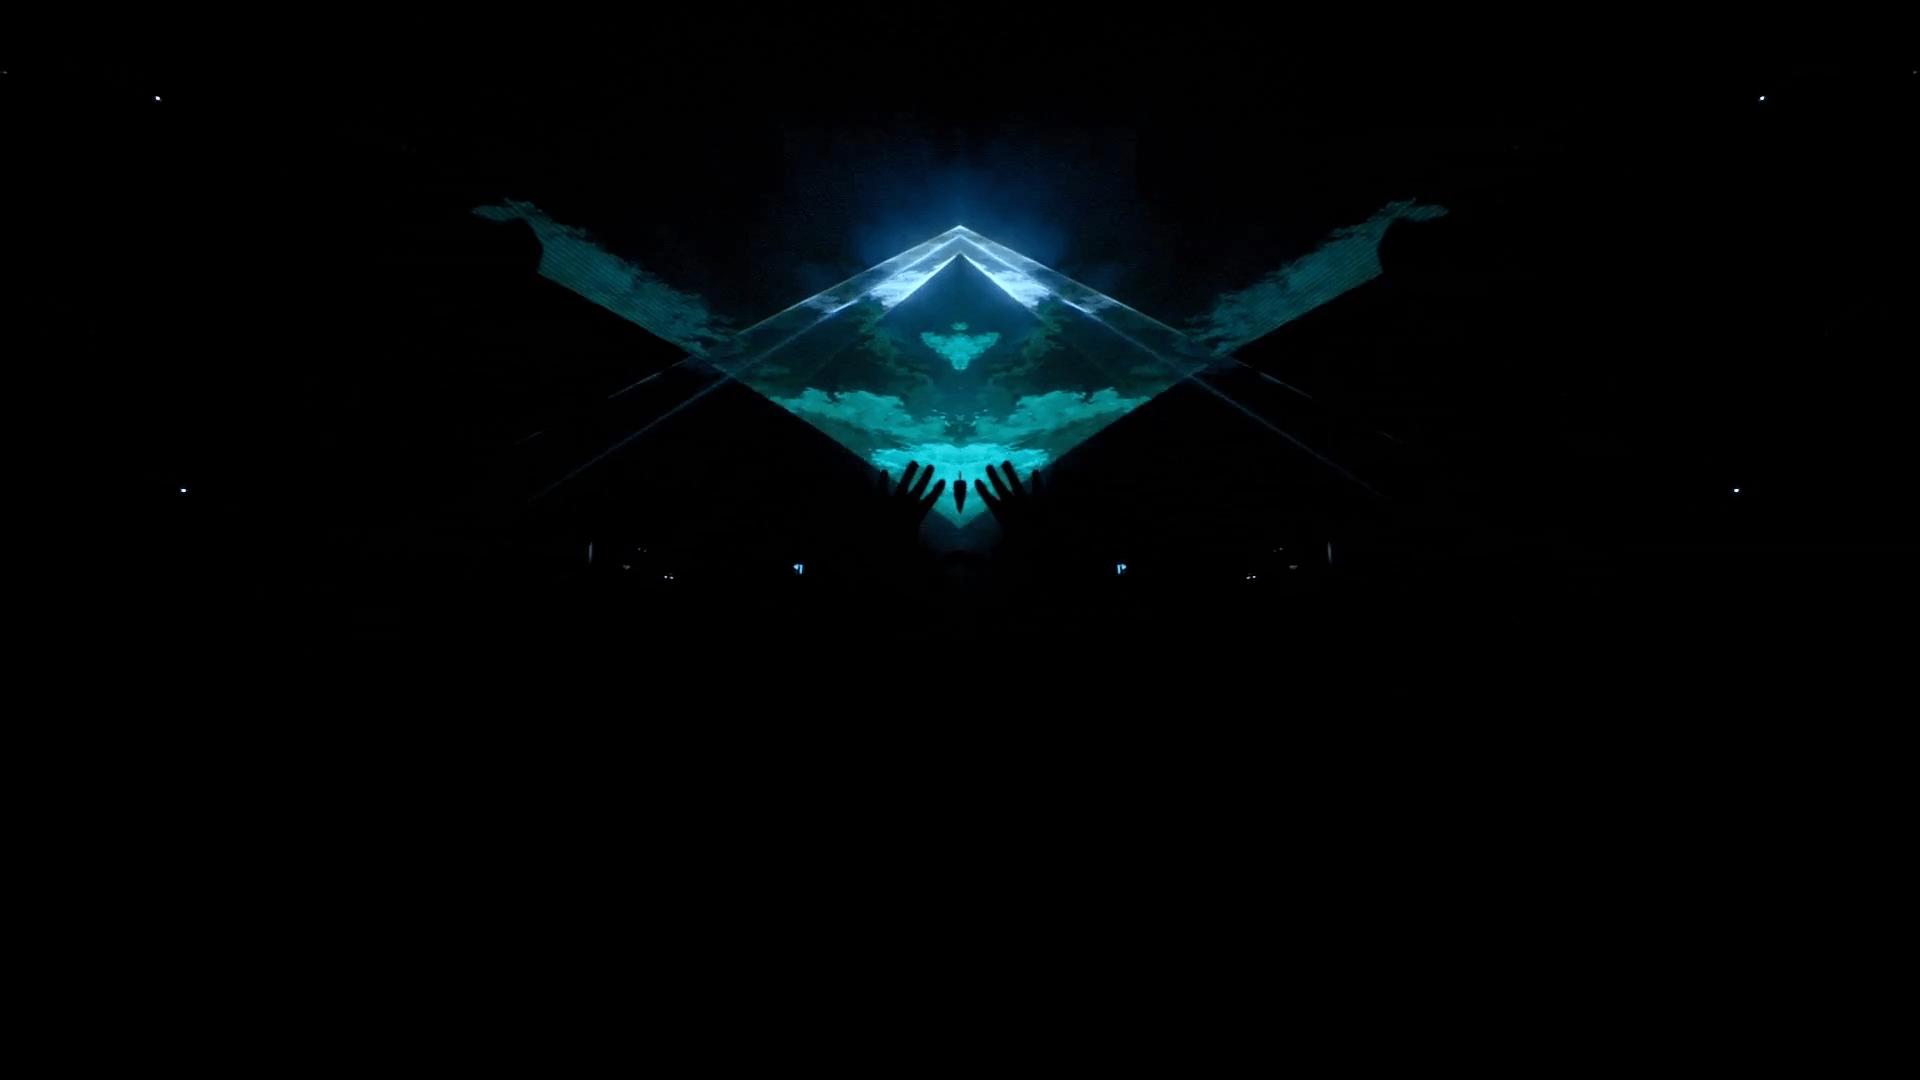 Gravity Falls Wallpapers Hd 1080p Illuminati Wallpapers Wallpaper Cave